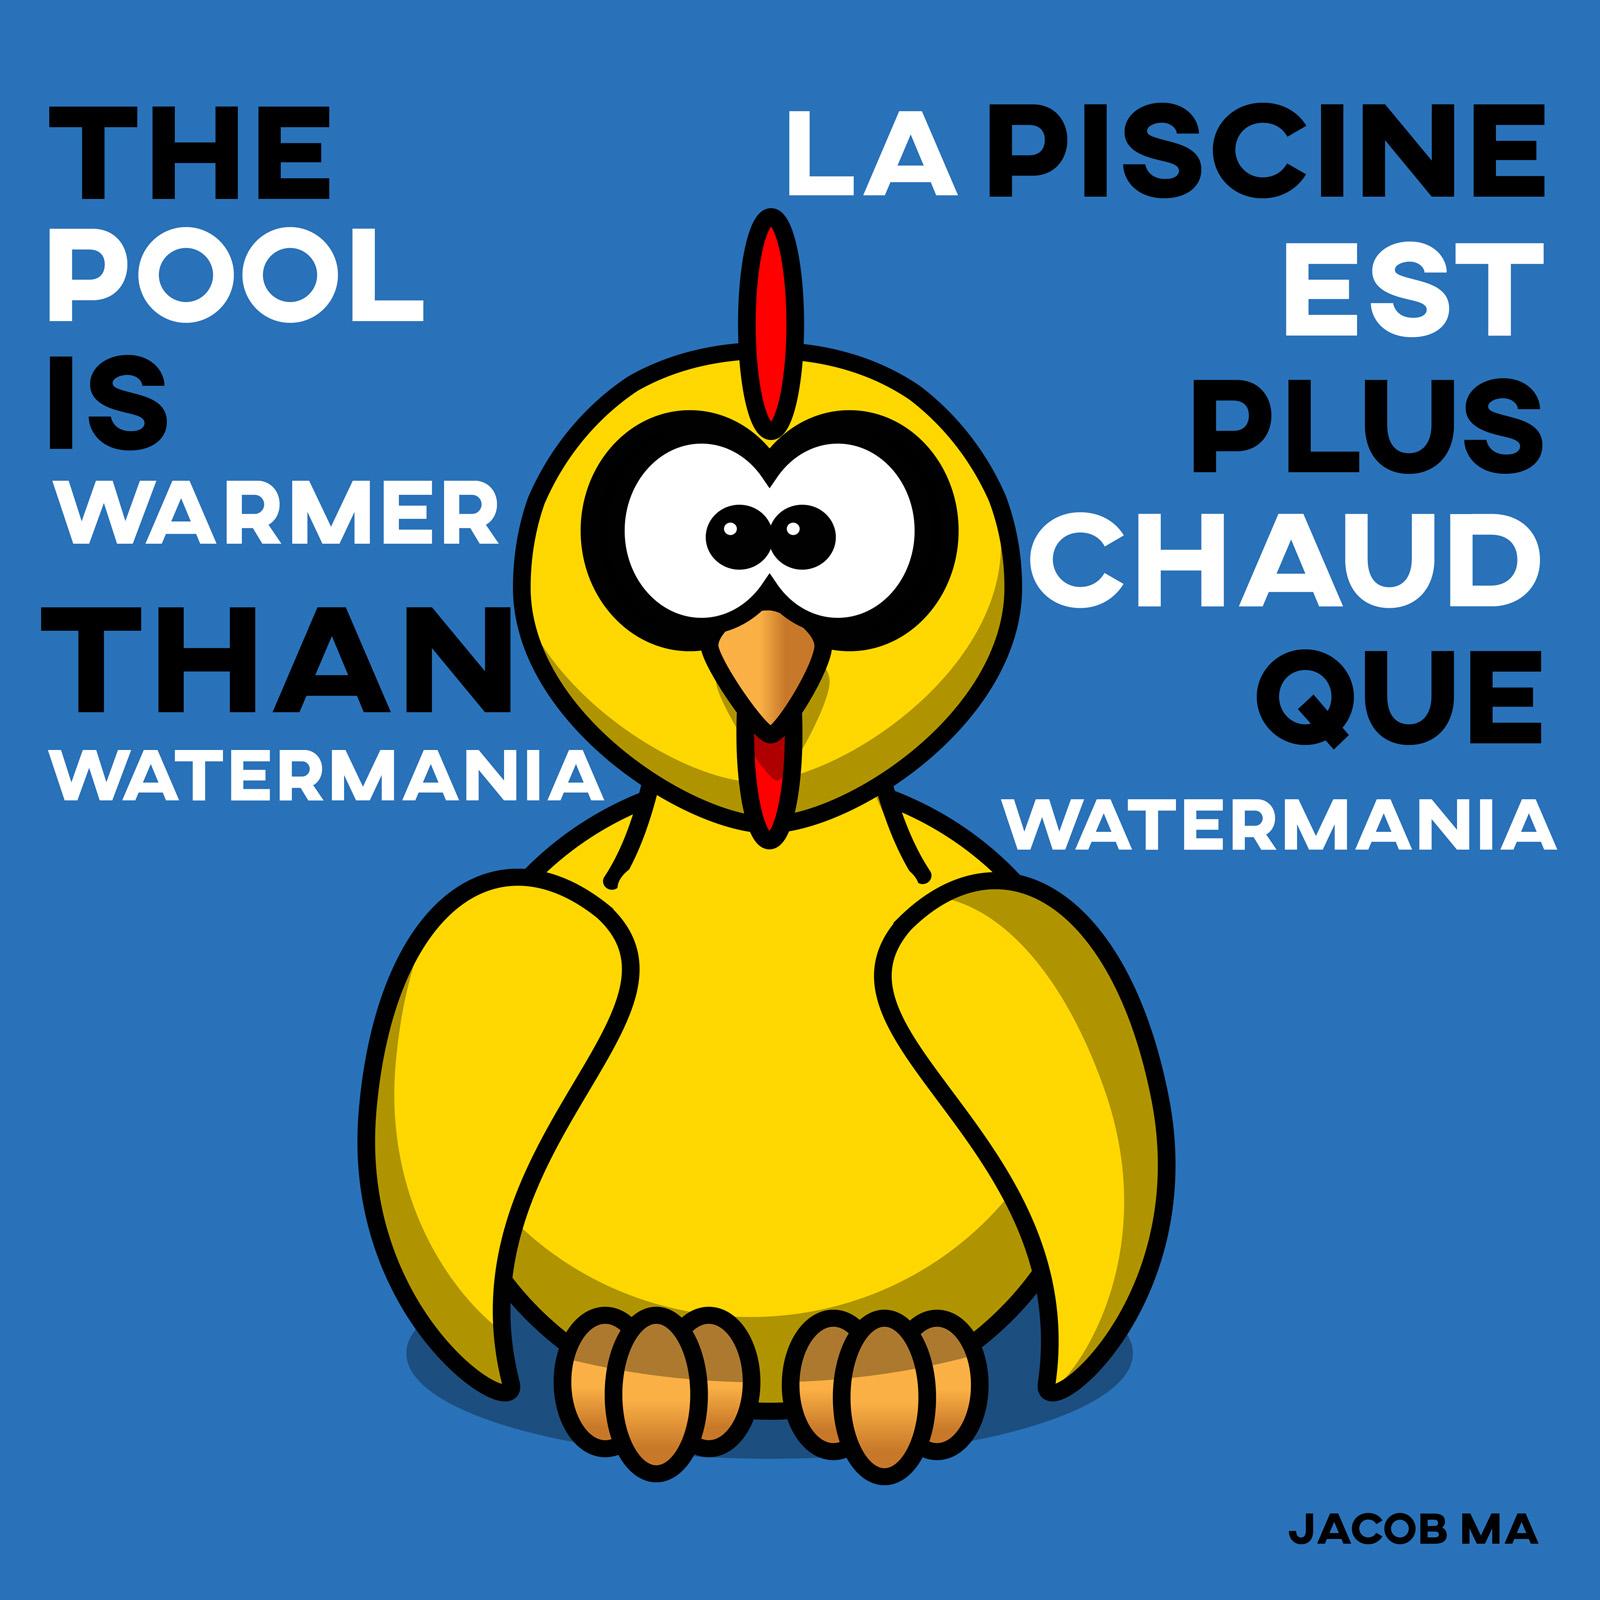 La piscine est plus chaud que Watermania. (The pool is warmer than Watermania)